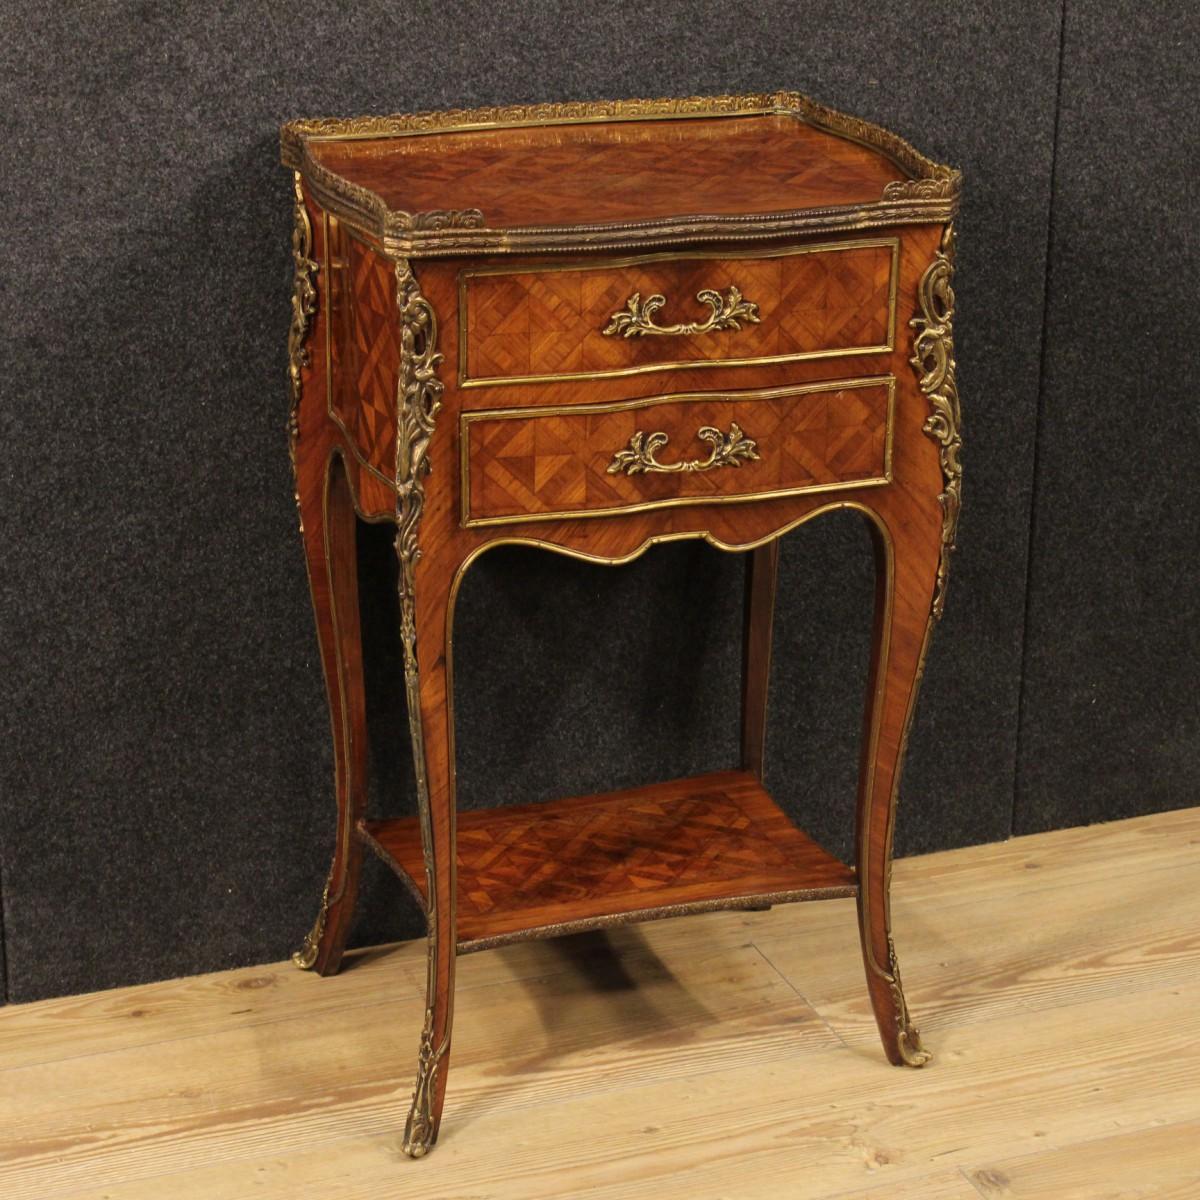 Tavolino francese comodino bois de rose bronzi epoca 39 900 - Tavolino comodino ...